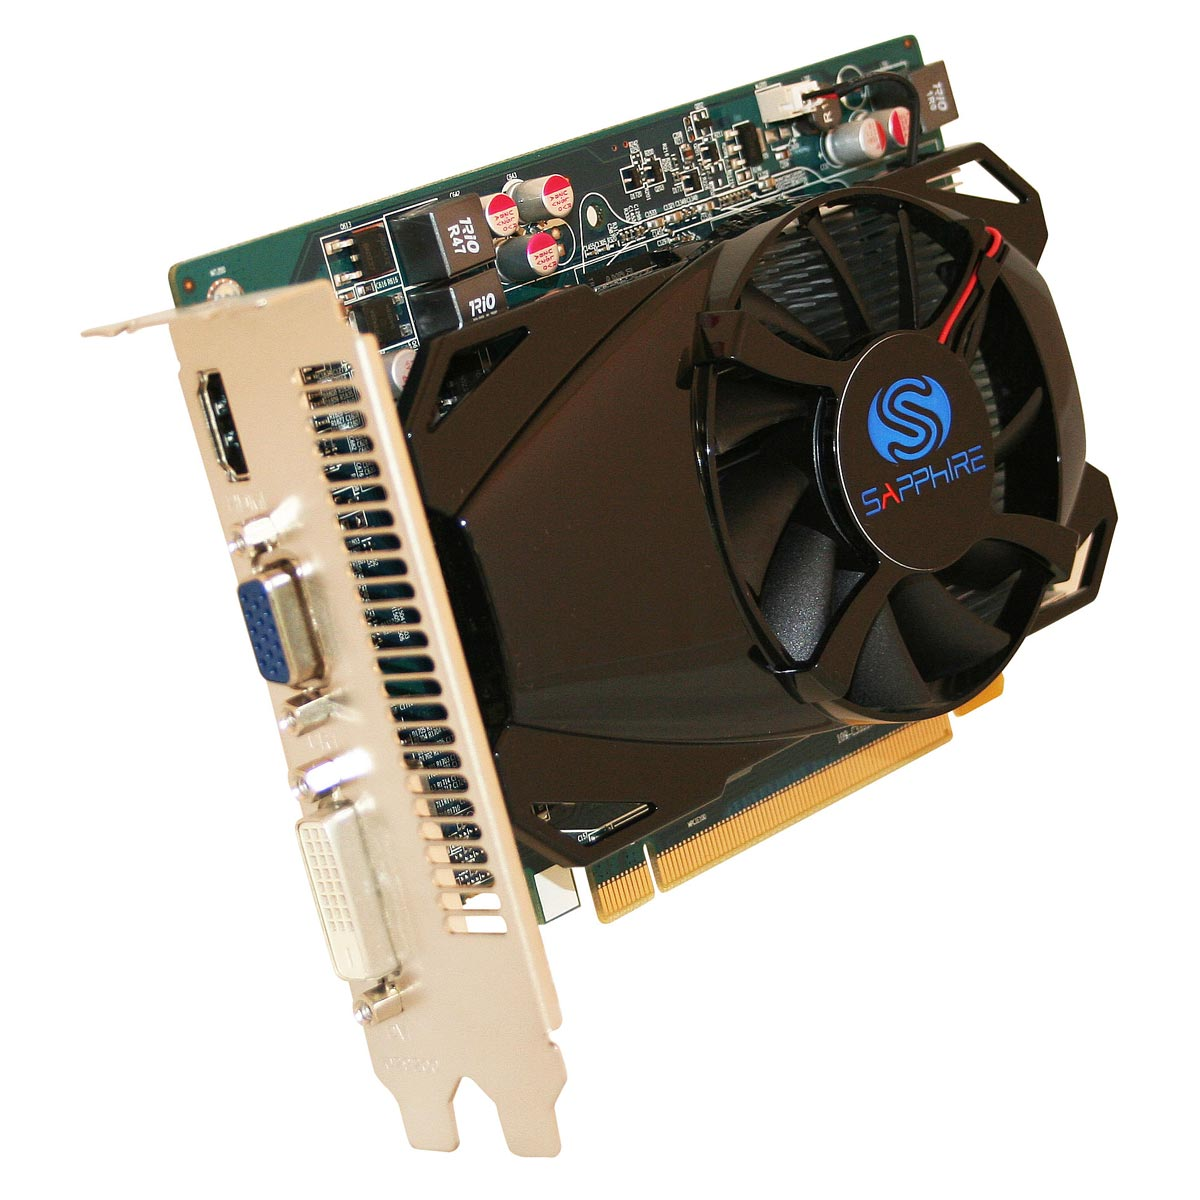 Carte graphique Sapphire Radeon HD 6670 1 GB DDR3 1 Go HDMI/DVI - PCI Express (AMD Radeon HD 6670)